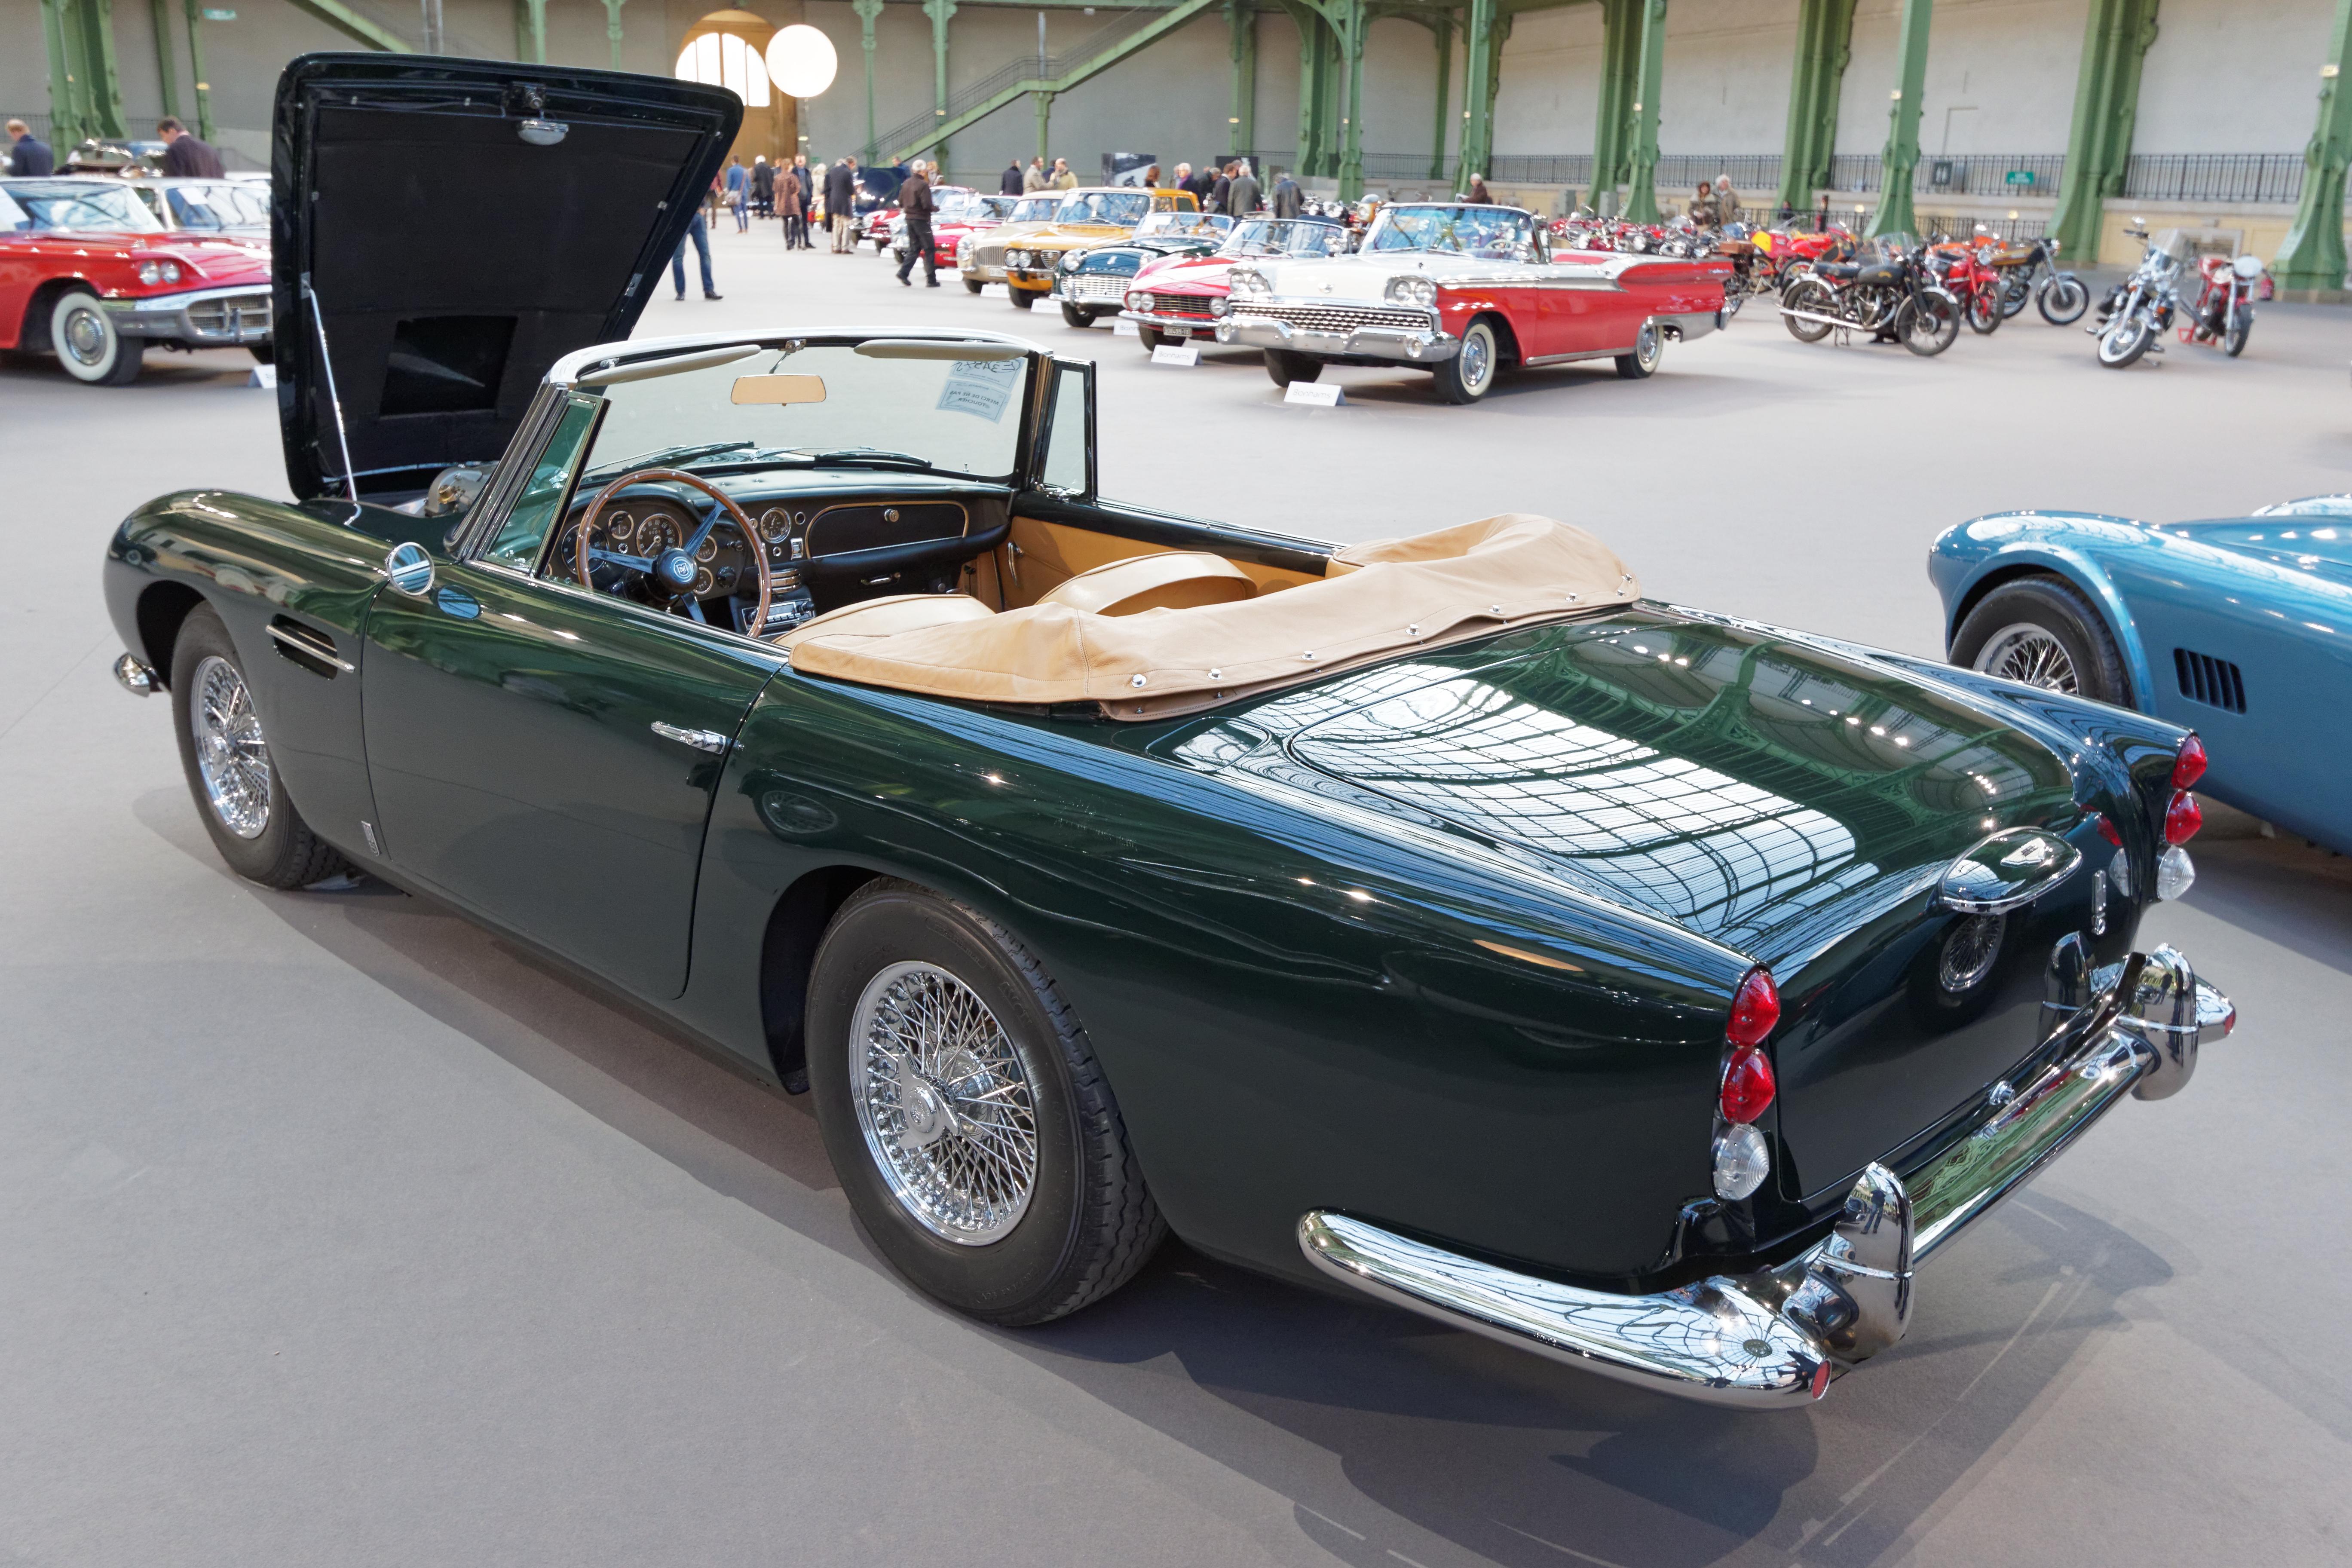 File Paris Bonhams 2015 Aston Martin Db5 Convertible 1965